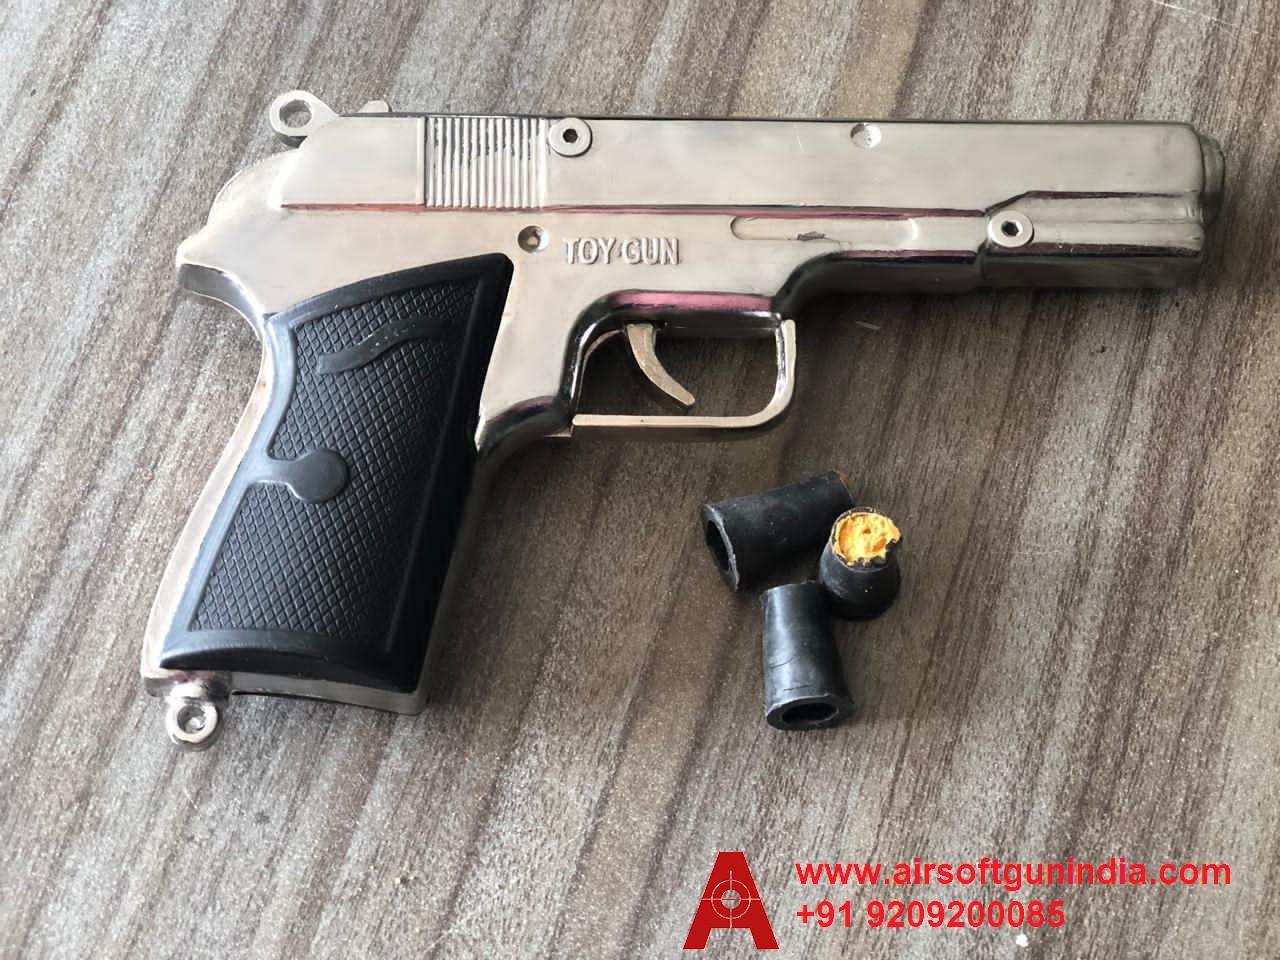 Silver  Cork Toy Gun By Airsoft Gun India